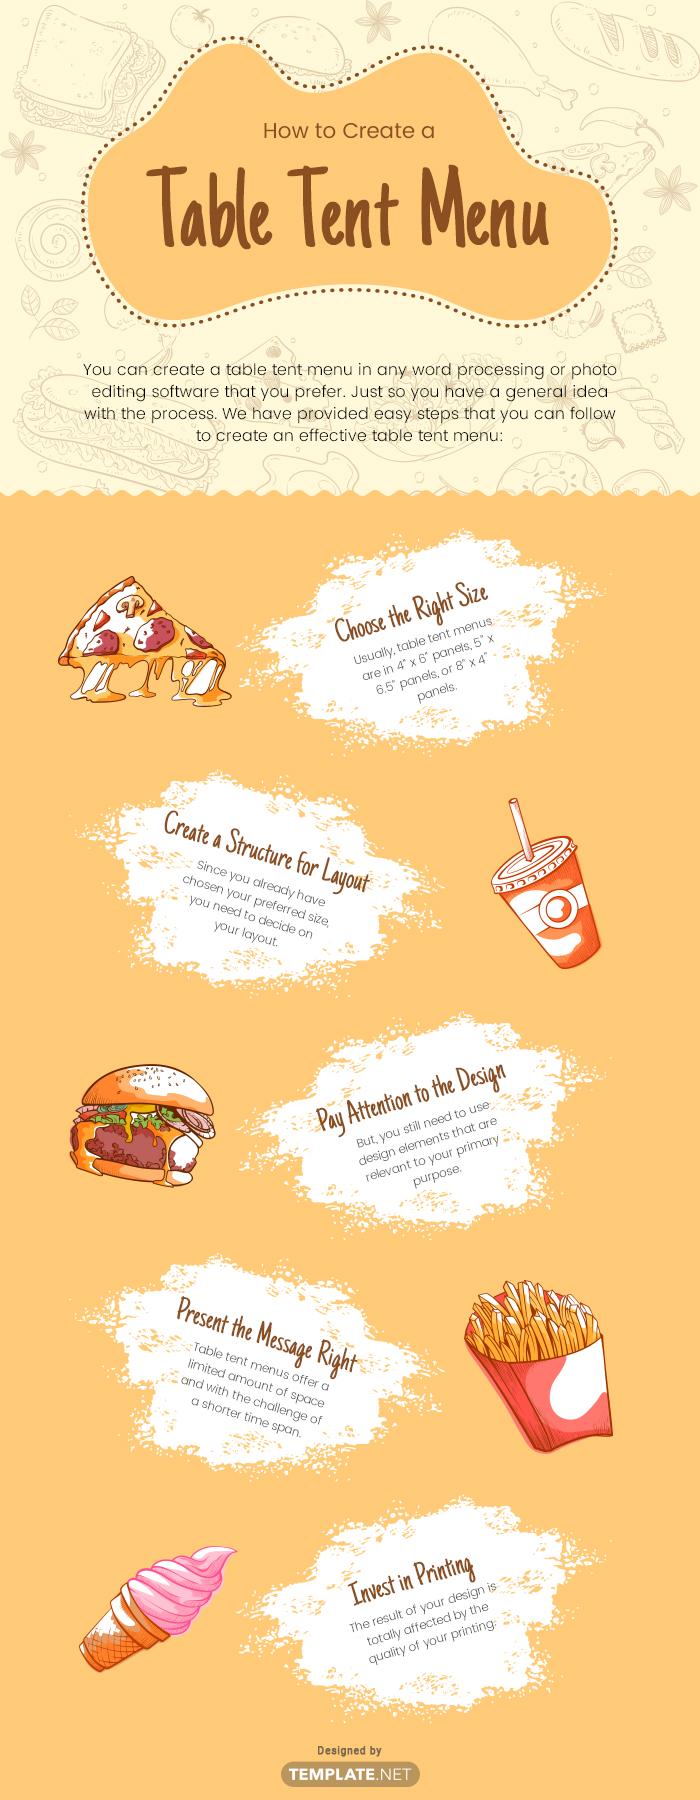 table tent menu template